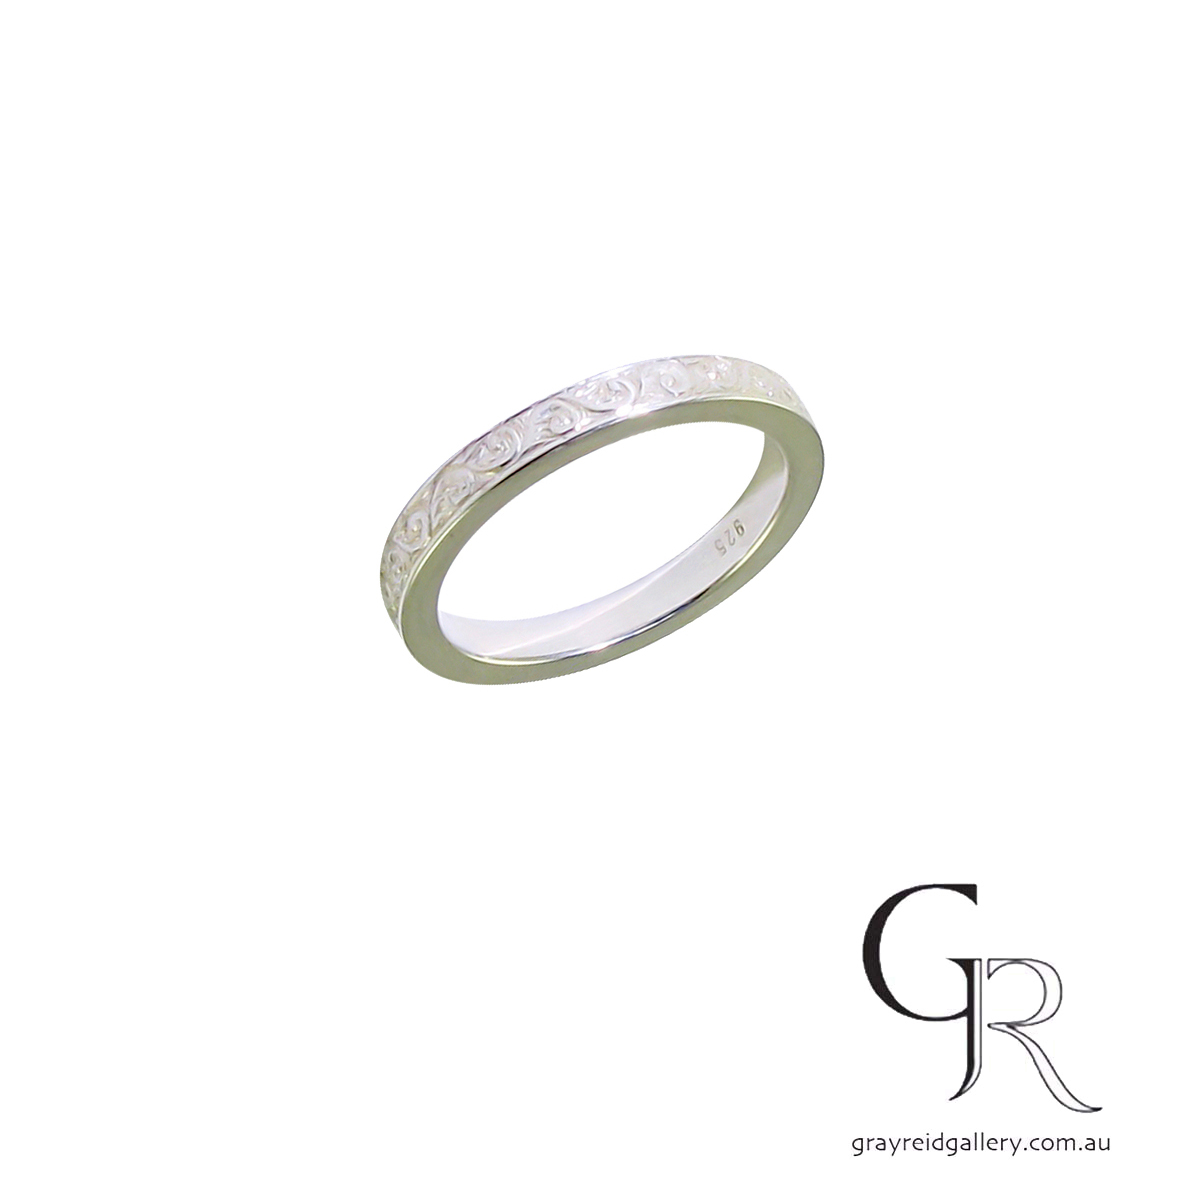 Wedding bands Melbourne mens jewellery Gray Reid Gallery platinum white gold gents ring 11.38.03.jpg